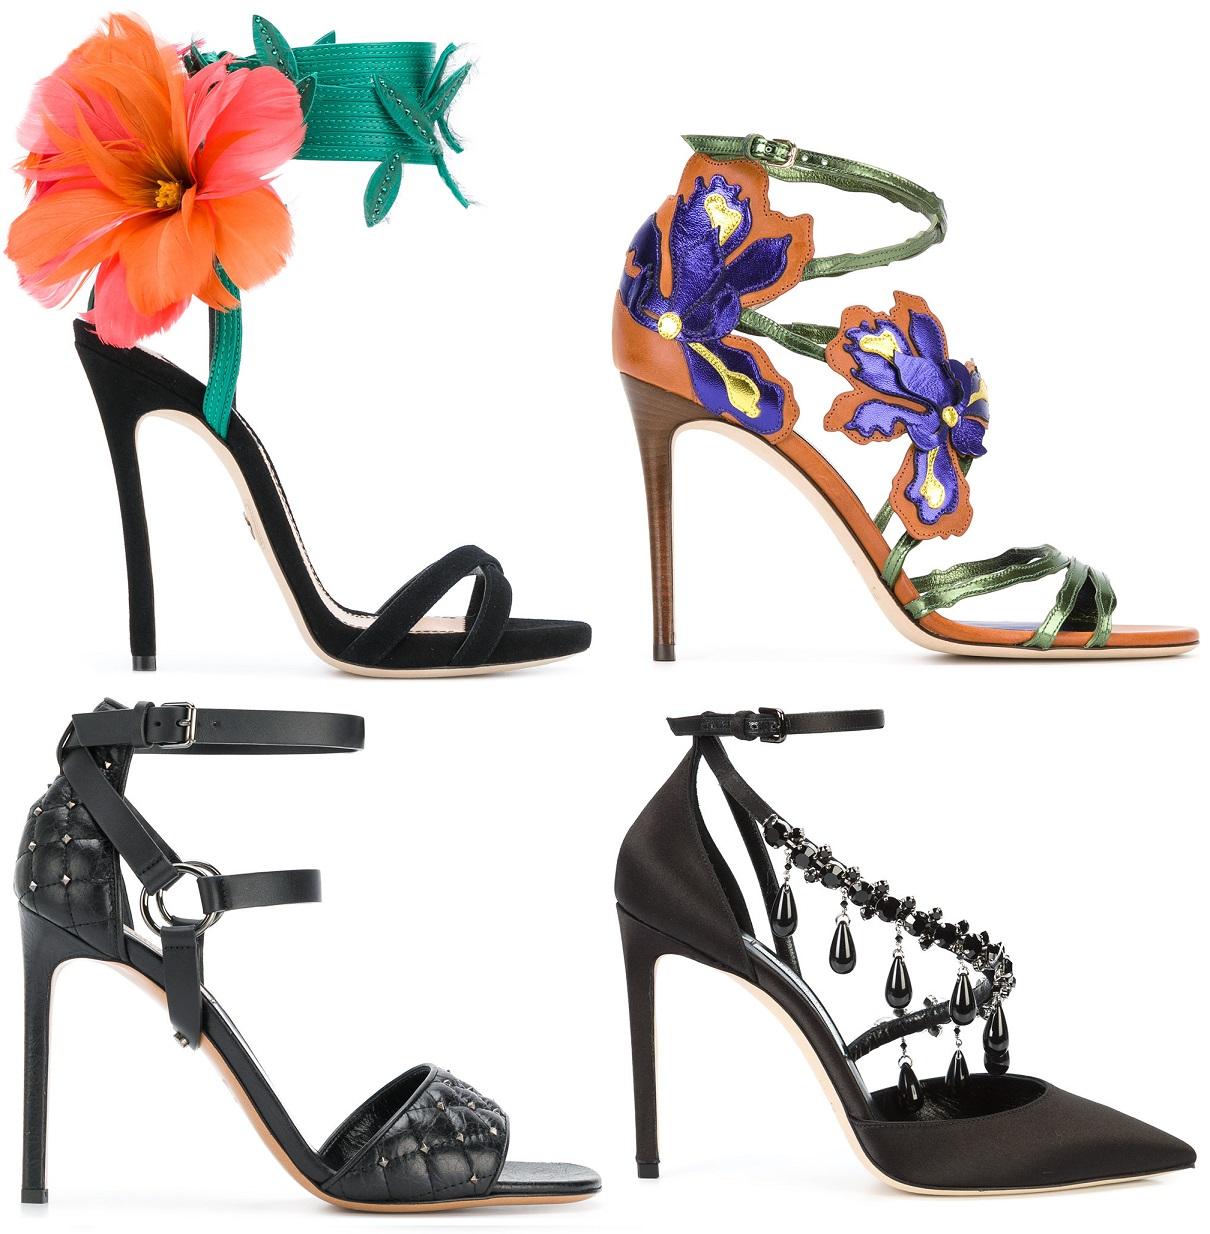 Какие каблуки сейчас в моде фото новинок и тенденций 2018